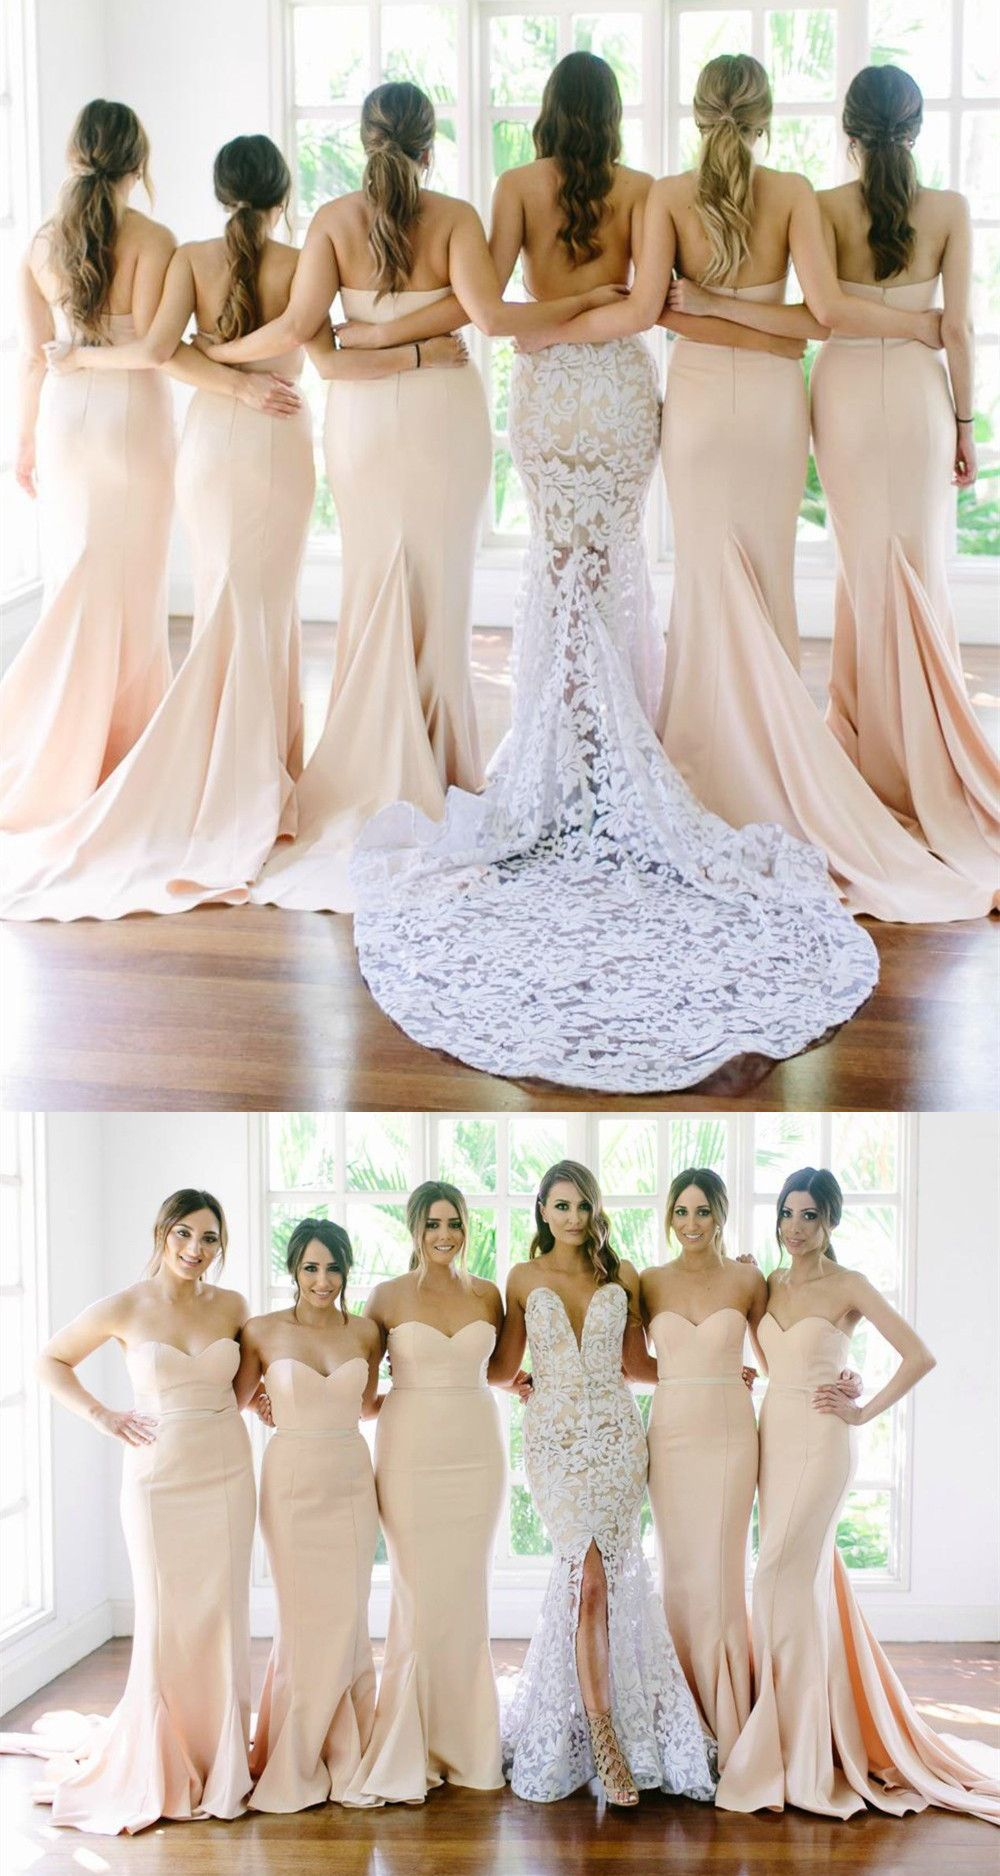 Sexy Strapless Mermaid Long Light Peach Bridesmaid Dress from modsele